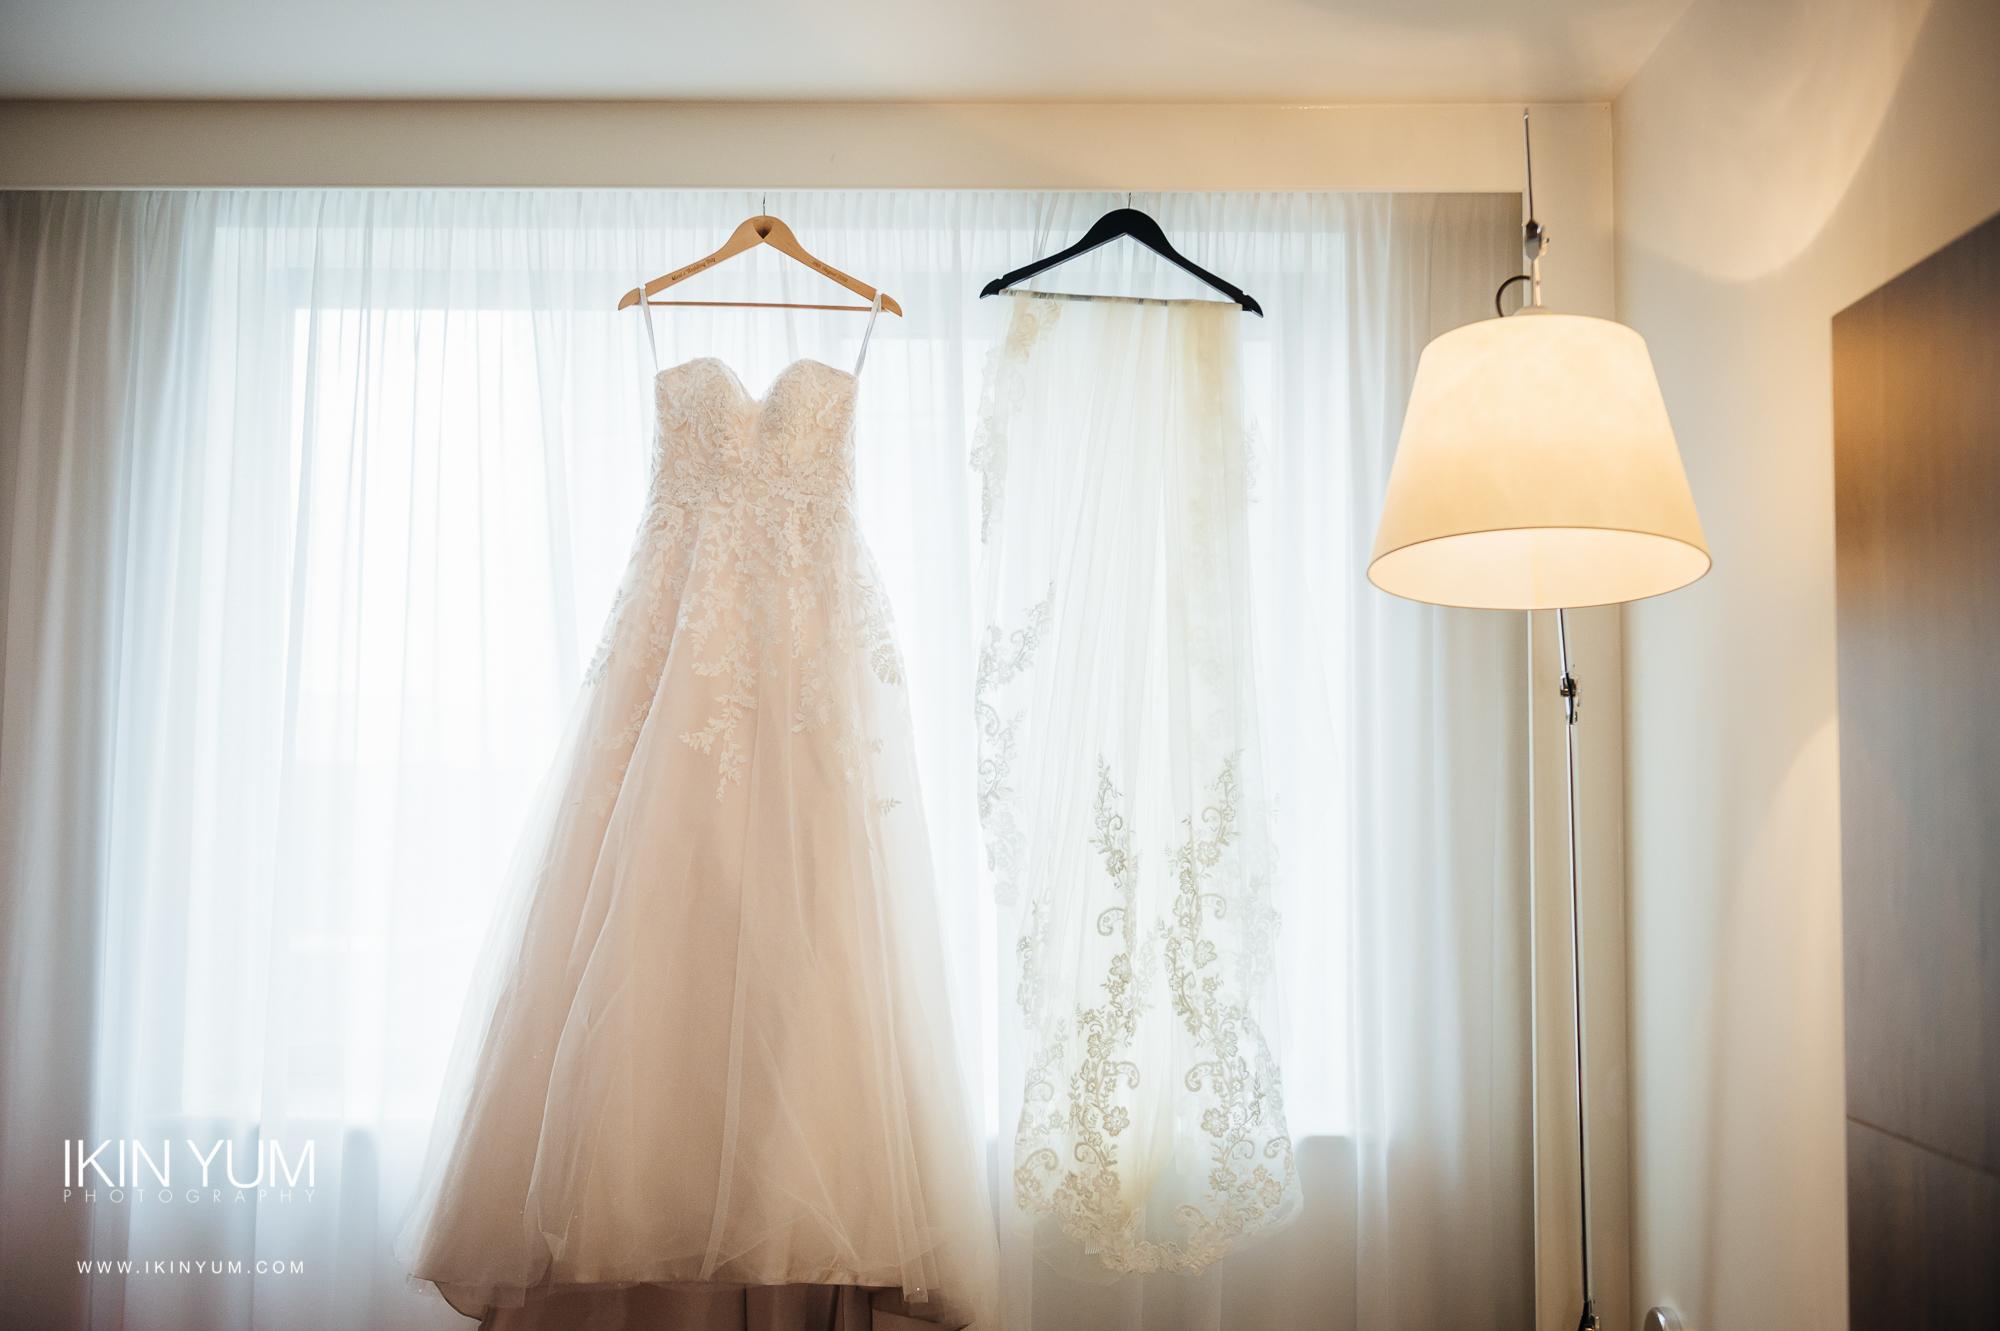 Syon Park Wedding - Ikin Yum Photography -009.jpg